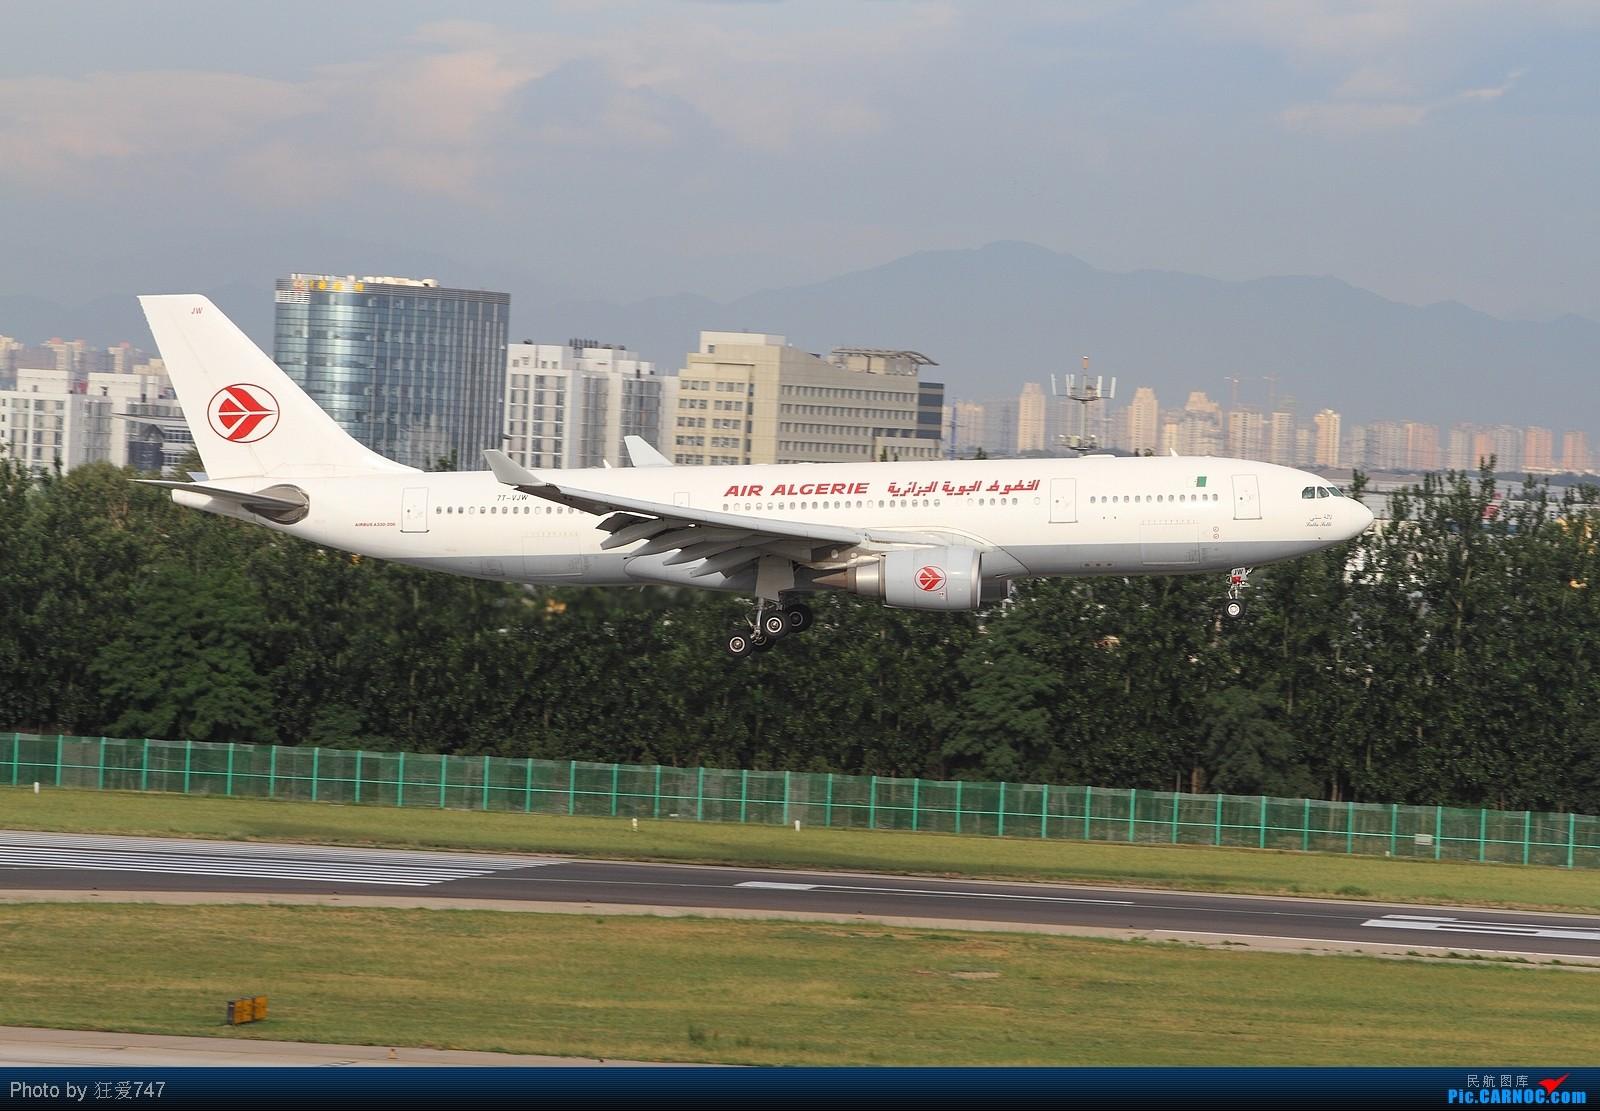 Re:[原创]西跑拍摄的一组外航飞机 AIRBUS A330-203 7T-VJW 中国北京首都机场